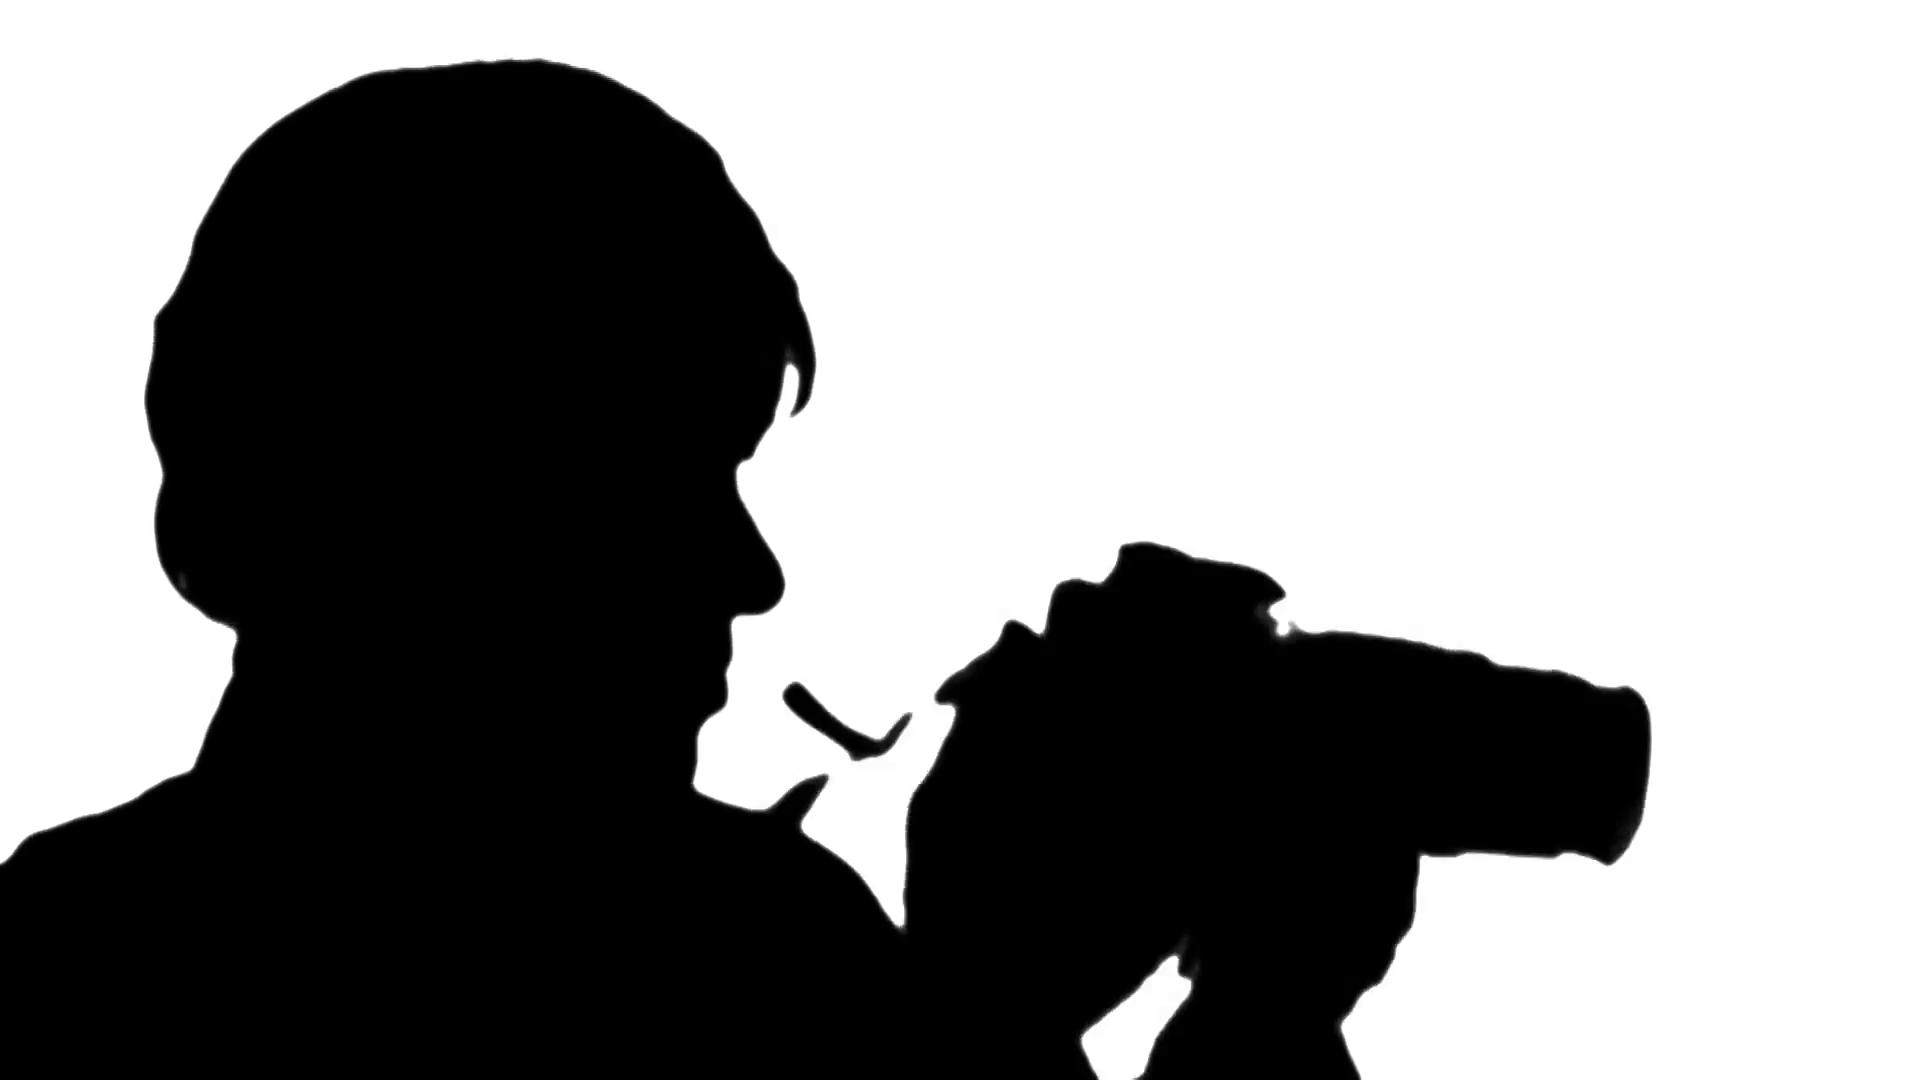 1920x1080 Photographer Silhouette